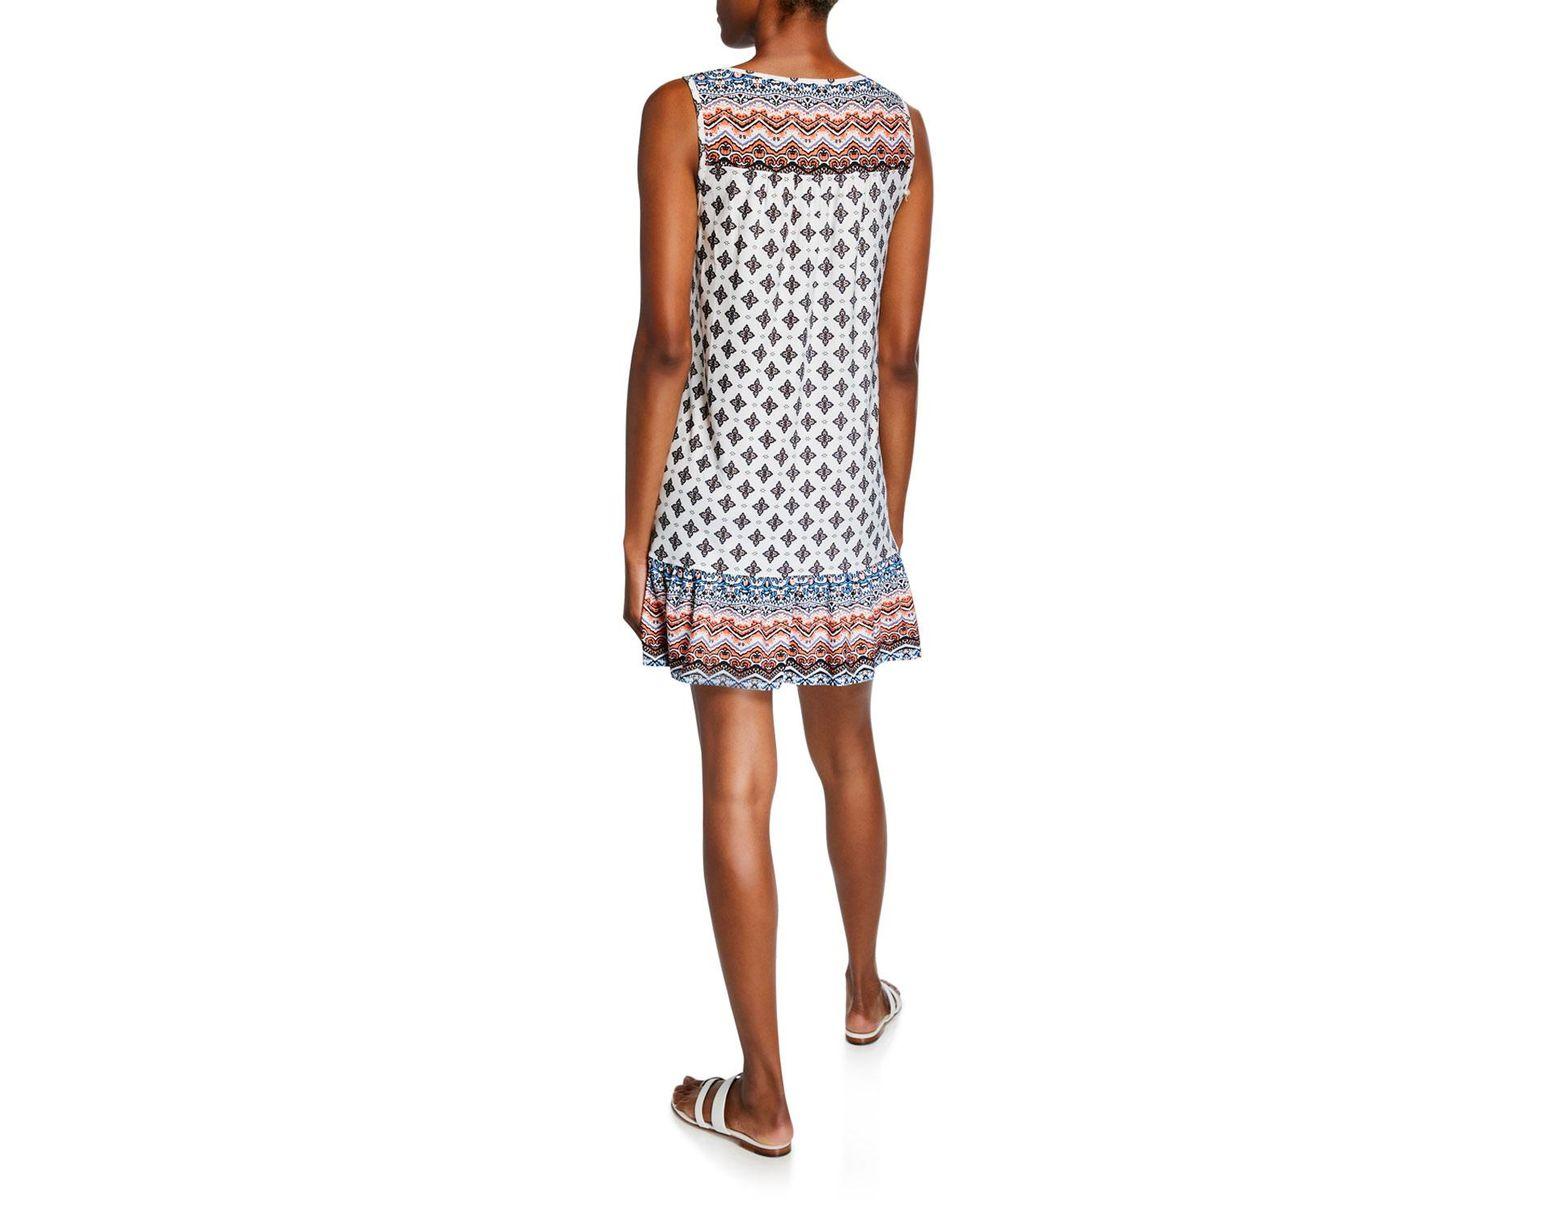 ad4c0f2f9c05 Neiman Marcus Border-print Keyhole Tank Dress in White - Lyst